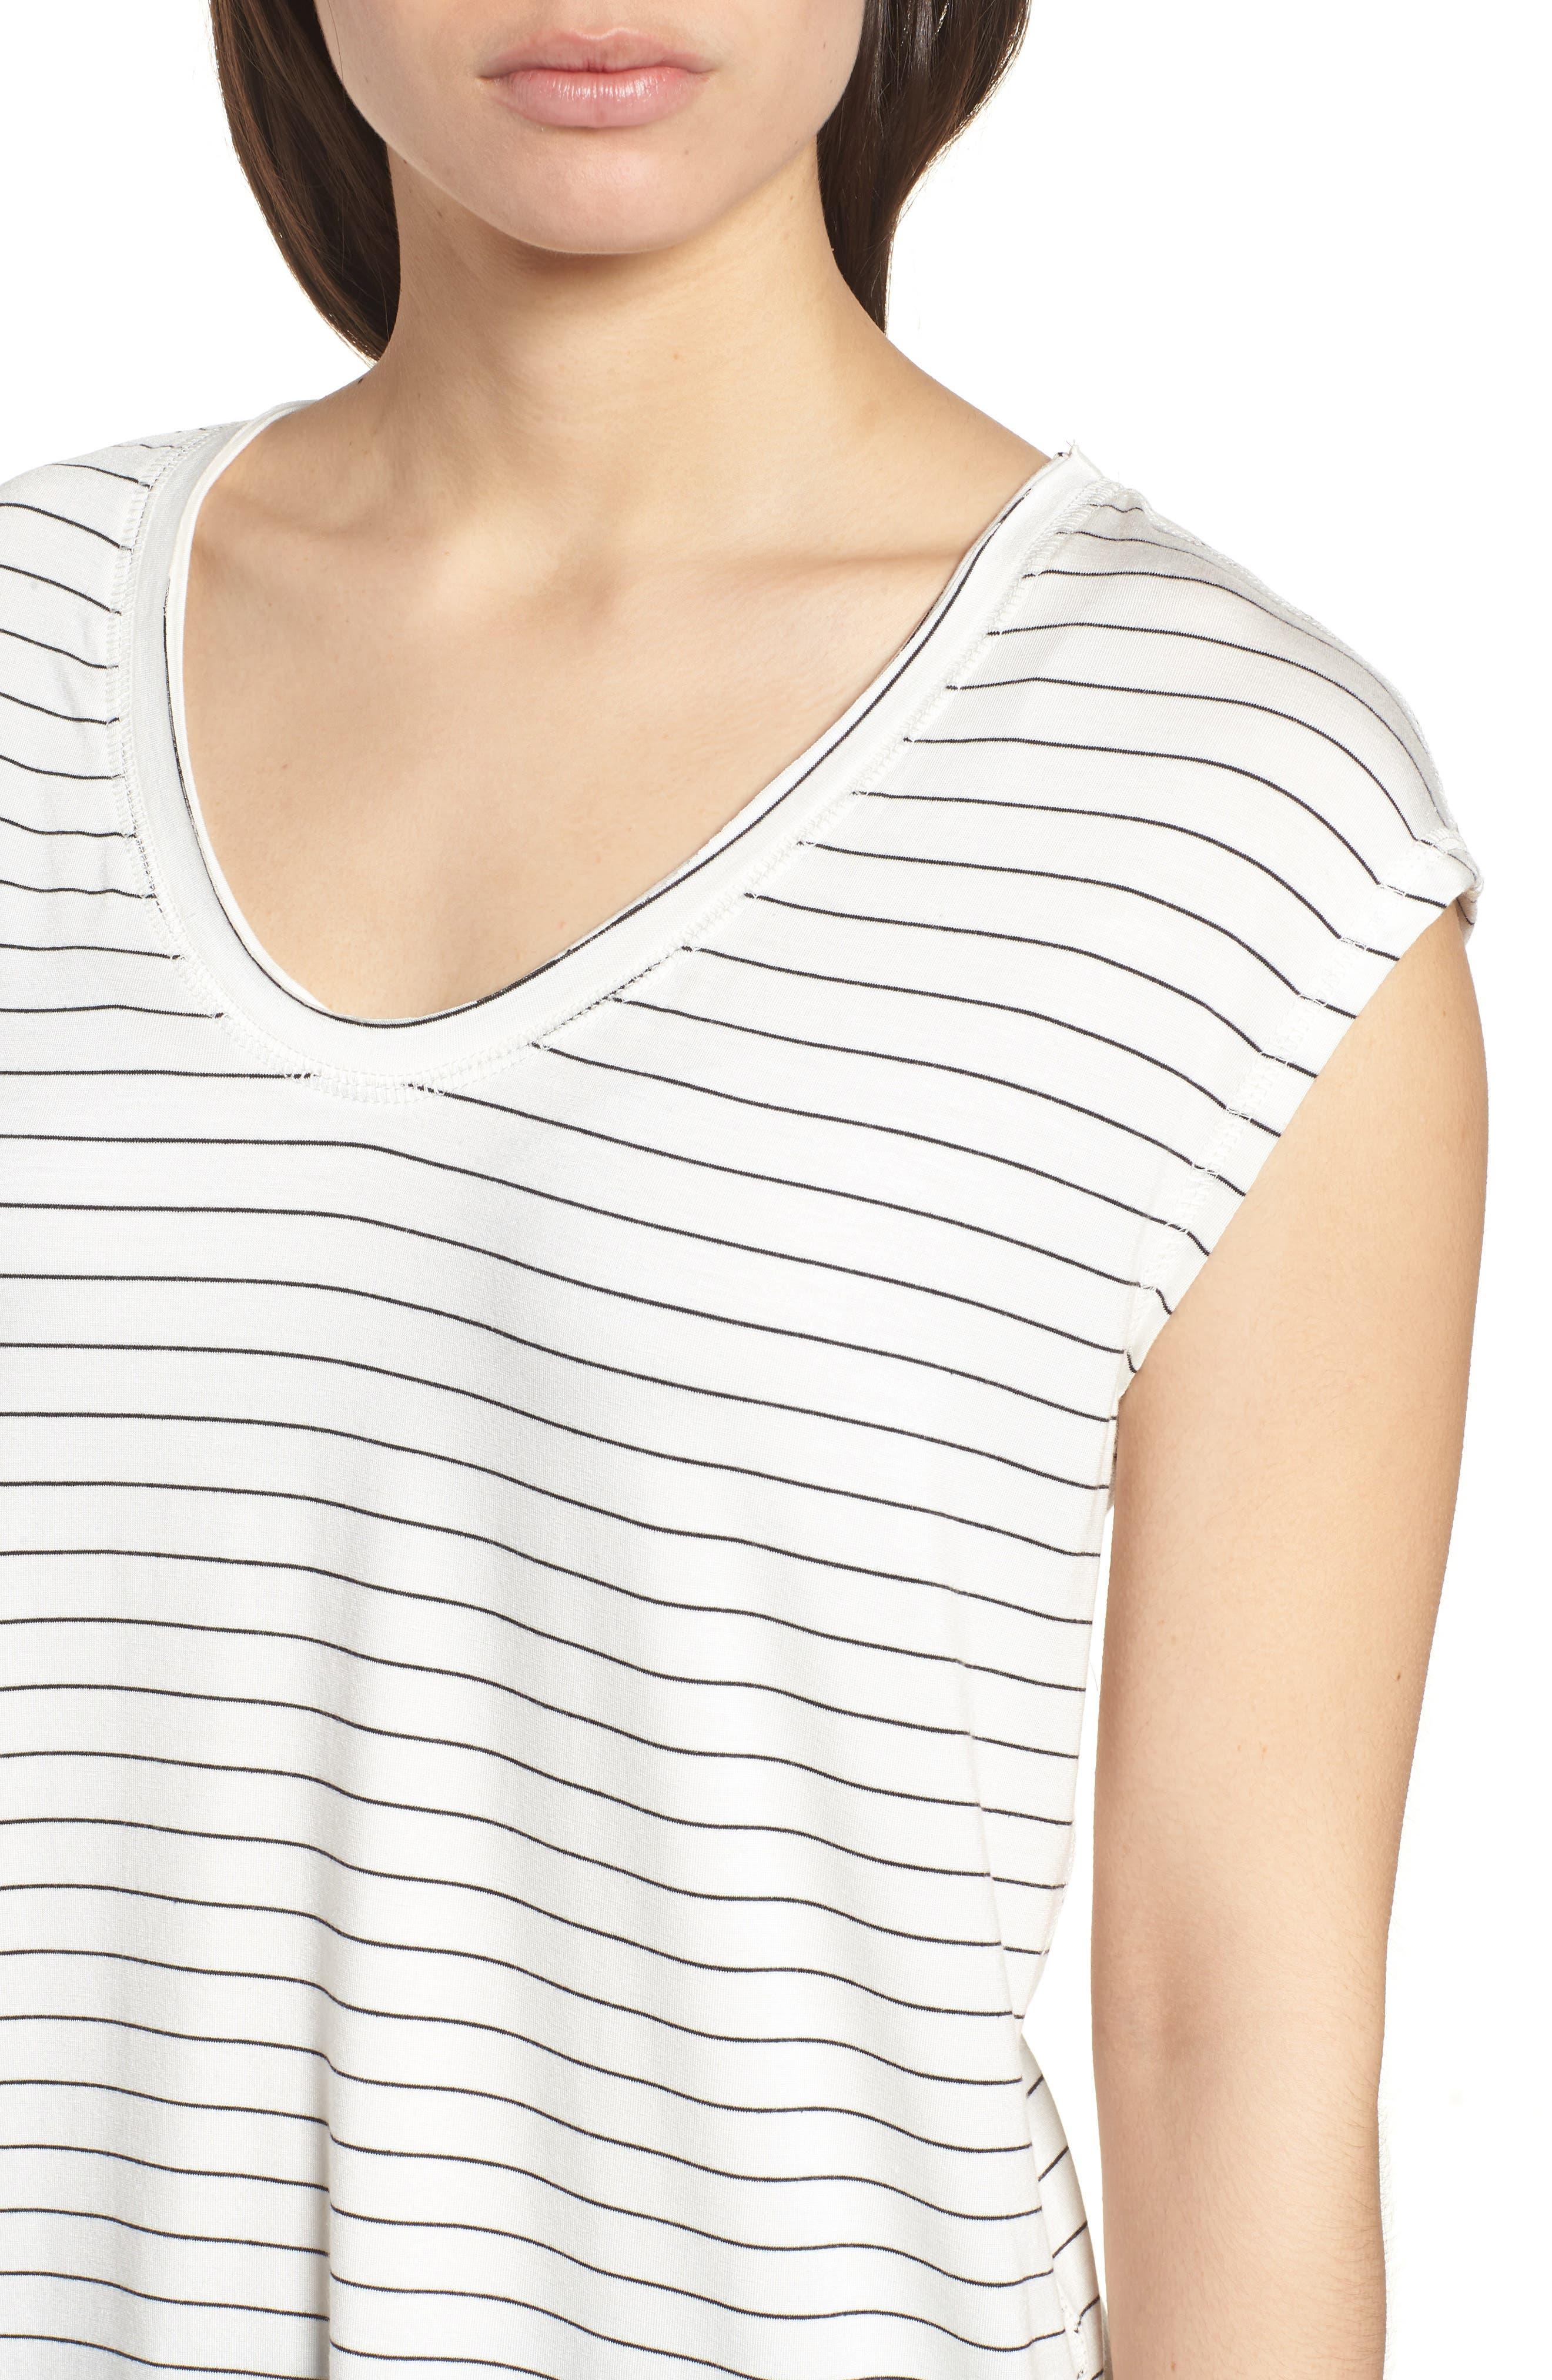 Off-Duty Sleeveless Stretch Knit Top,                             Alternate thumbnail 4, color,                             White- Black Cloud Stripe